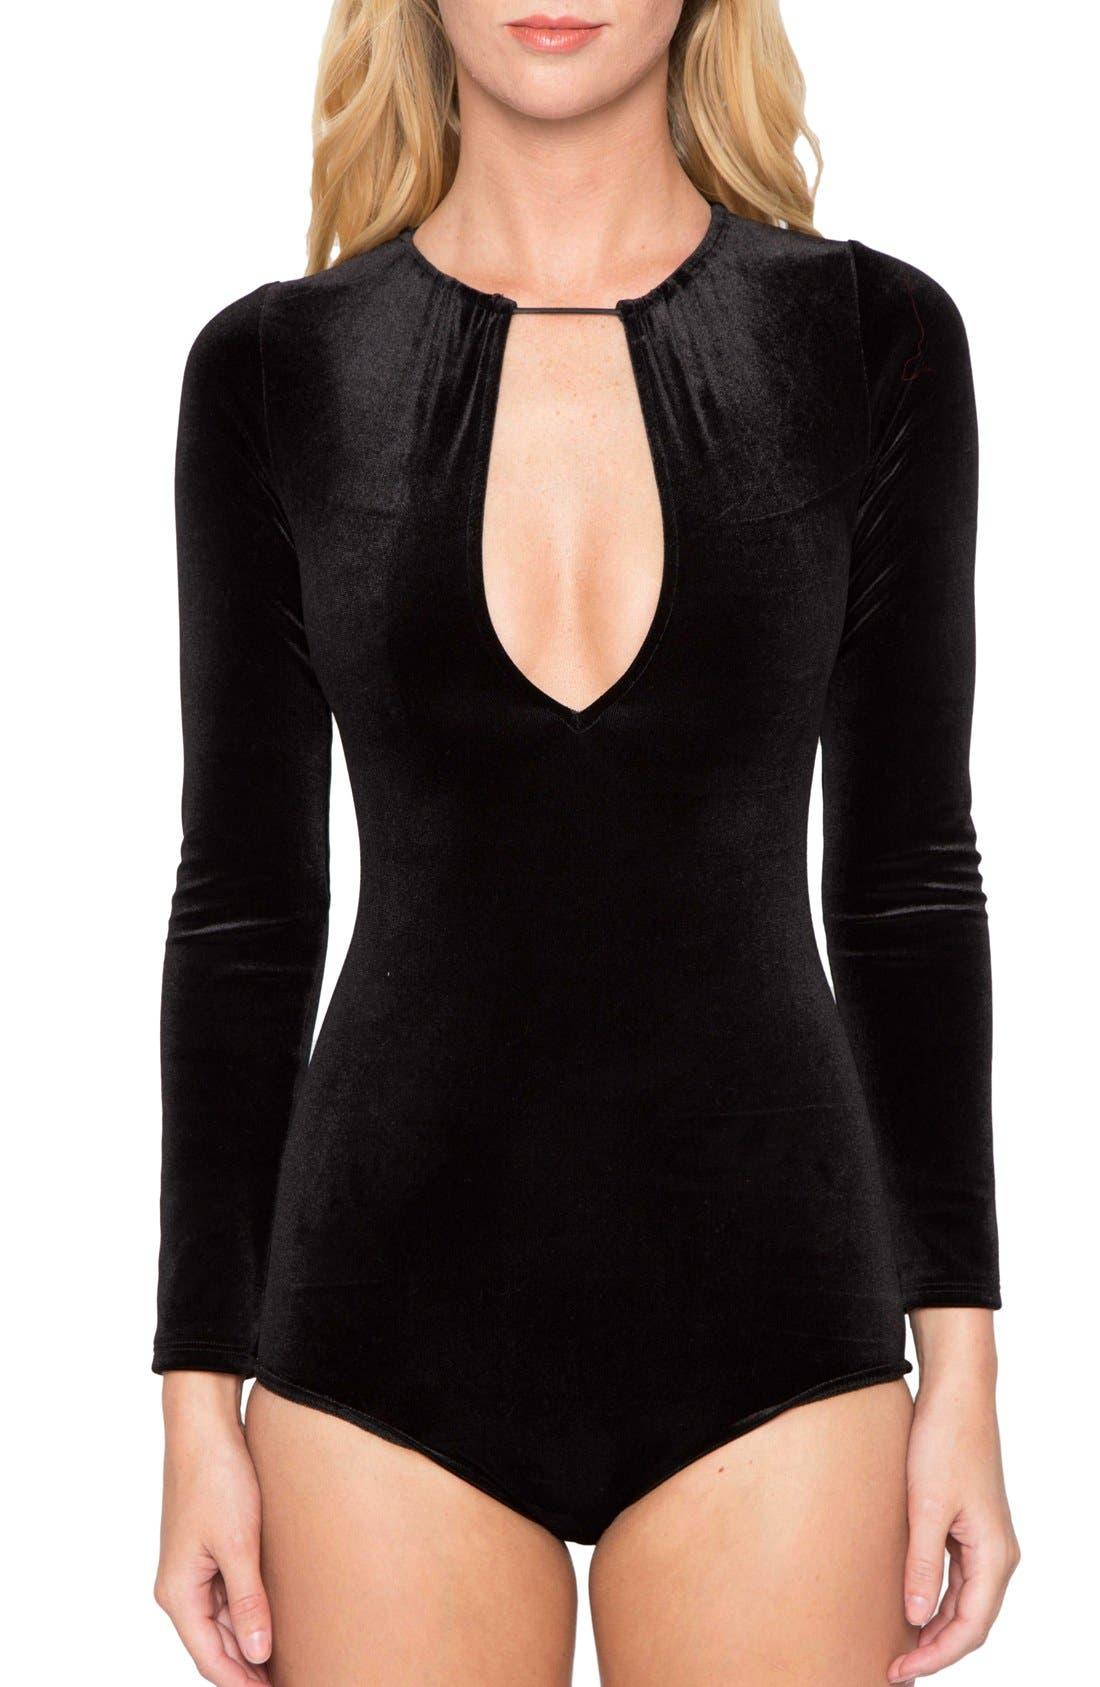 Alternate Image 1 Selected - Willow & Clay Keyhole Velvet Bodysuit